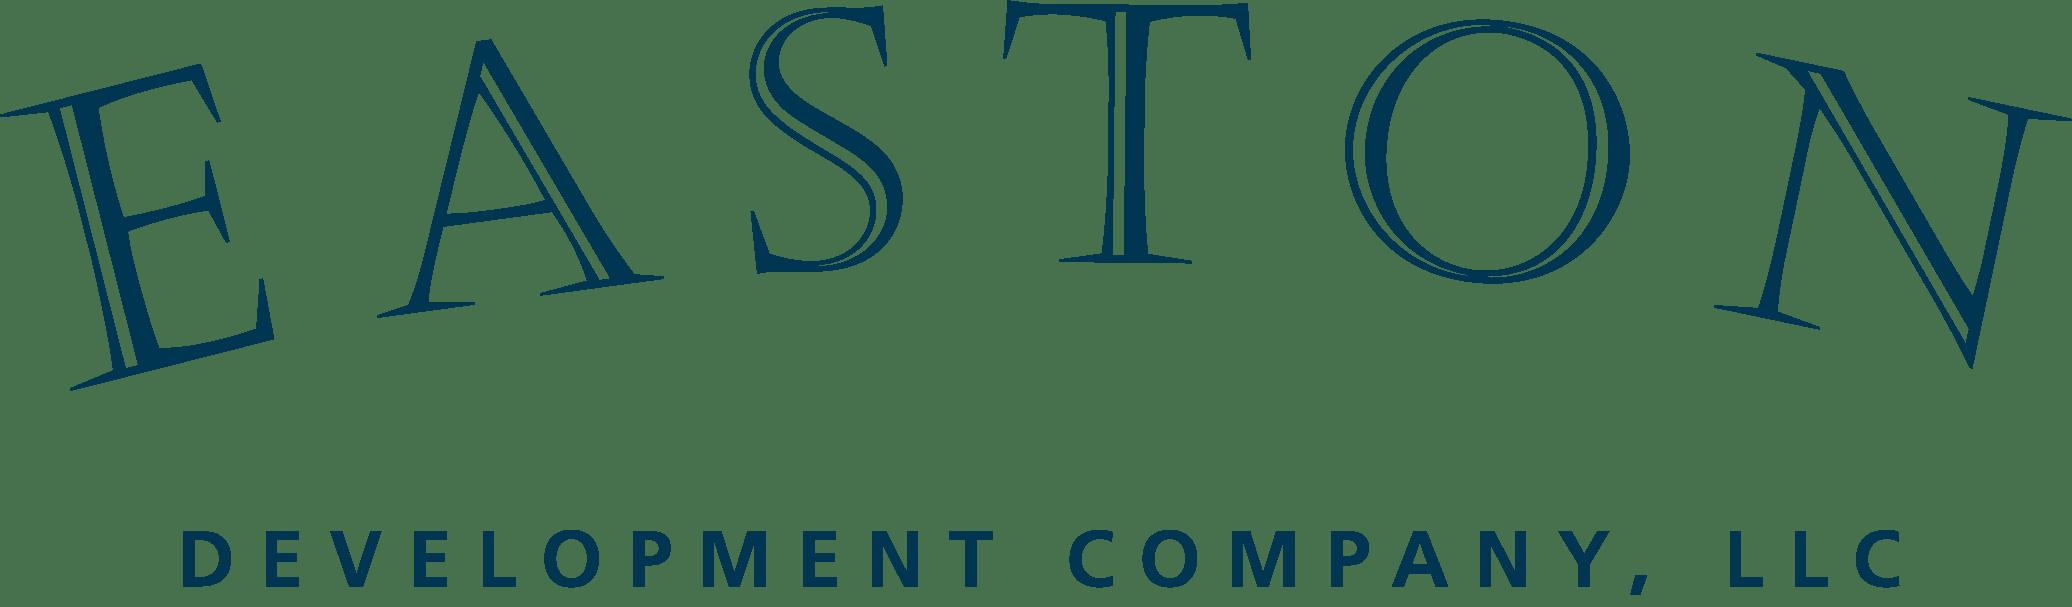 Easton Development Corp logo